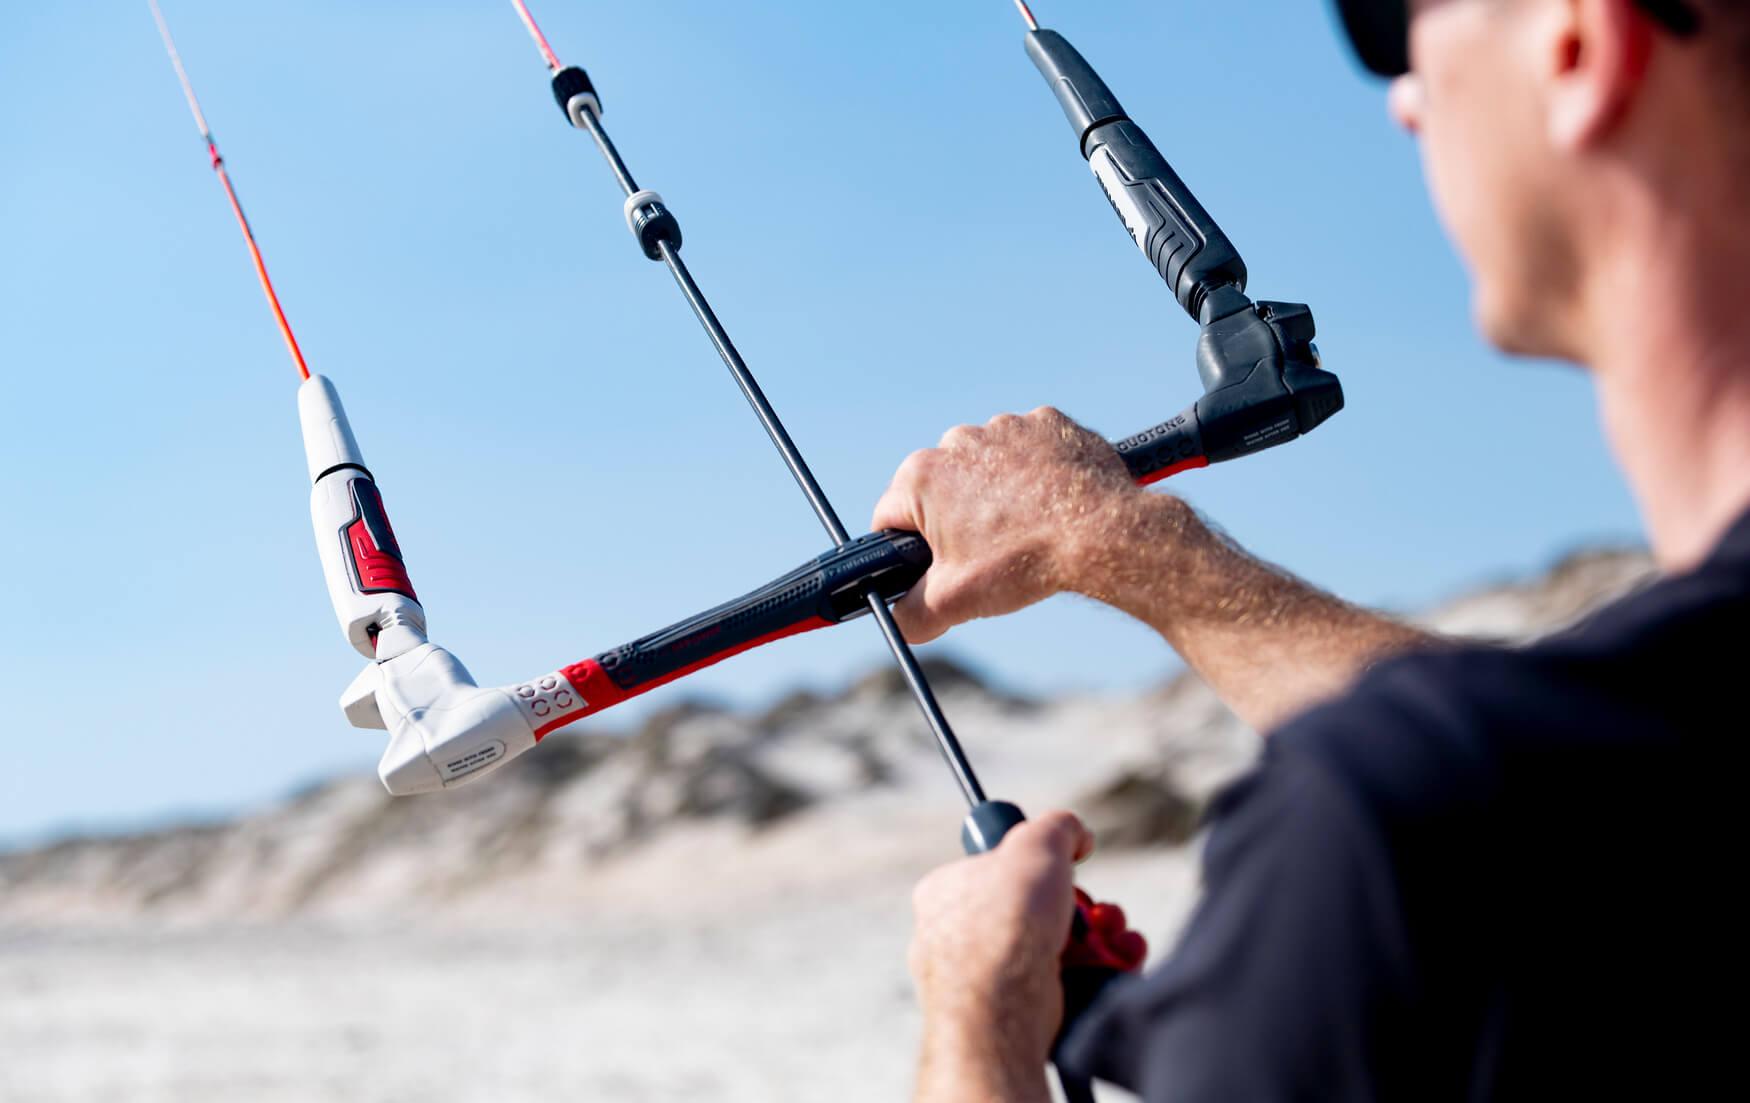 Barre de kitesurf - Click Bar - Duotone kiteboarding 2021